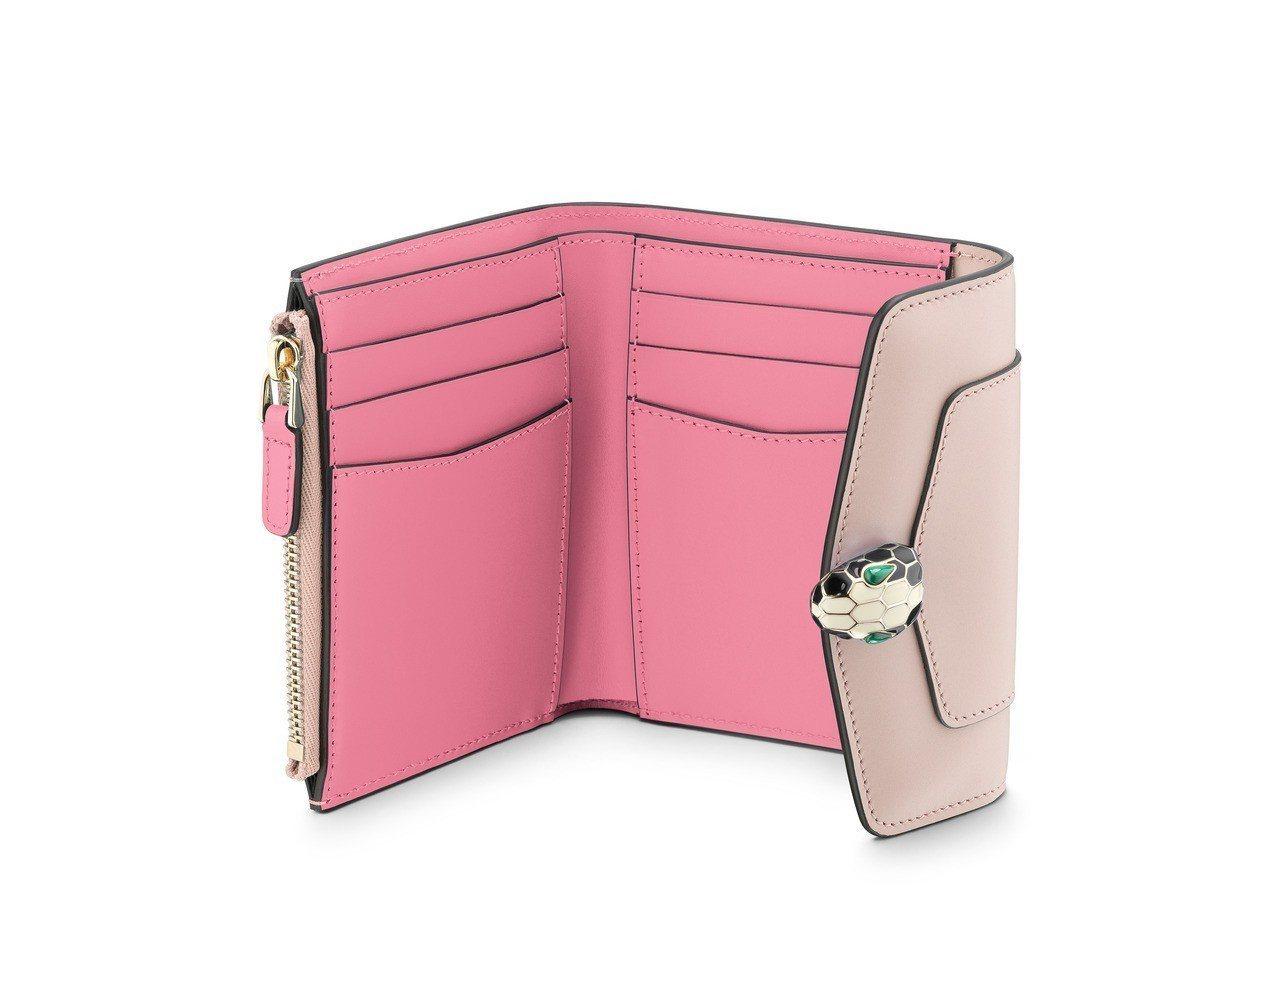 寶格麗POP WISHES系列SERPENTI FOREVER皮夾,19,000...